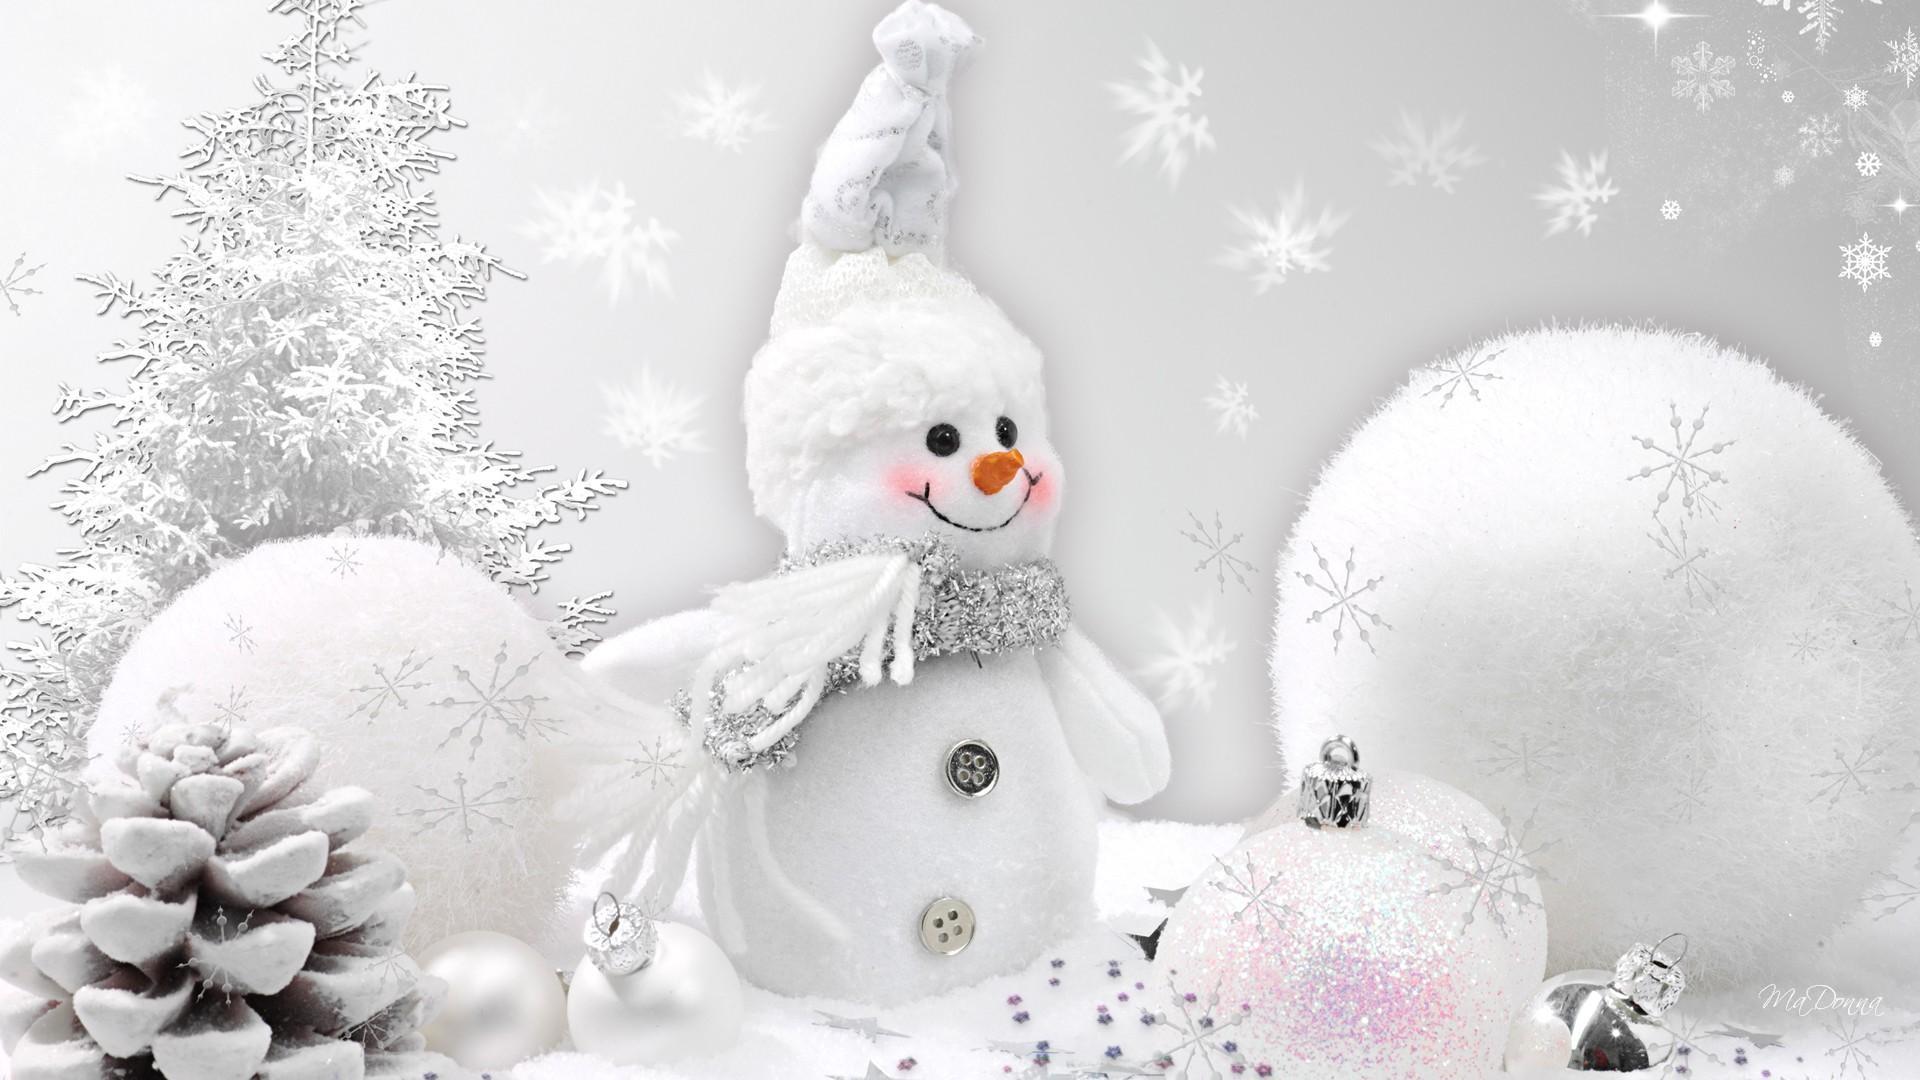 Cute Snowman Christmas Wallpaper Snowman Desktop Backgrounds 55 Images